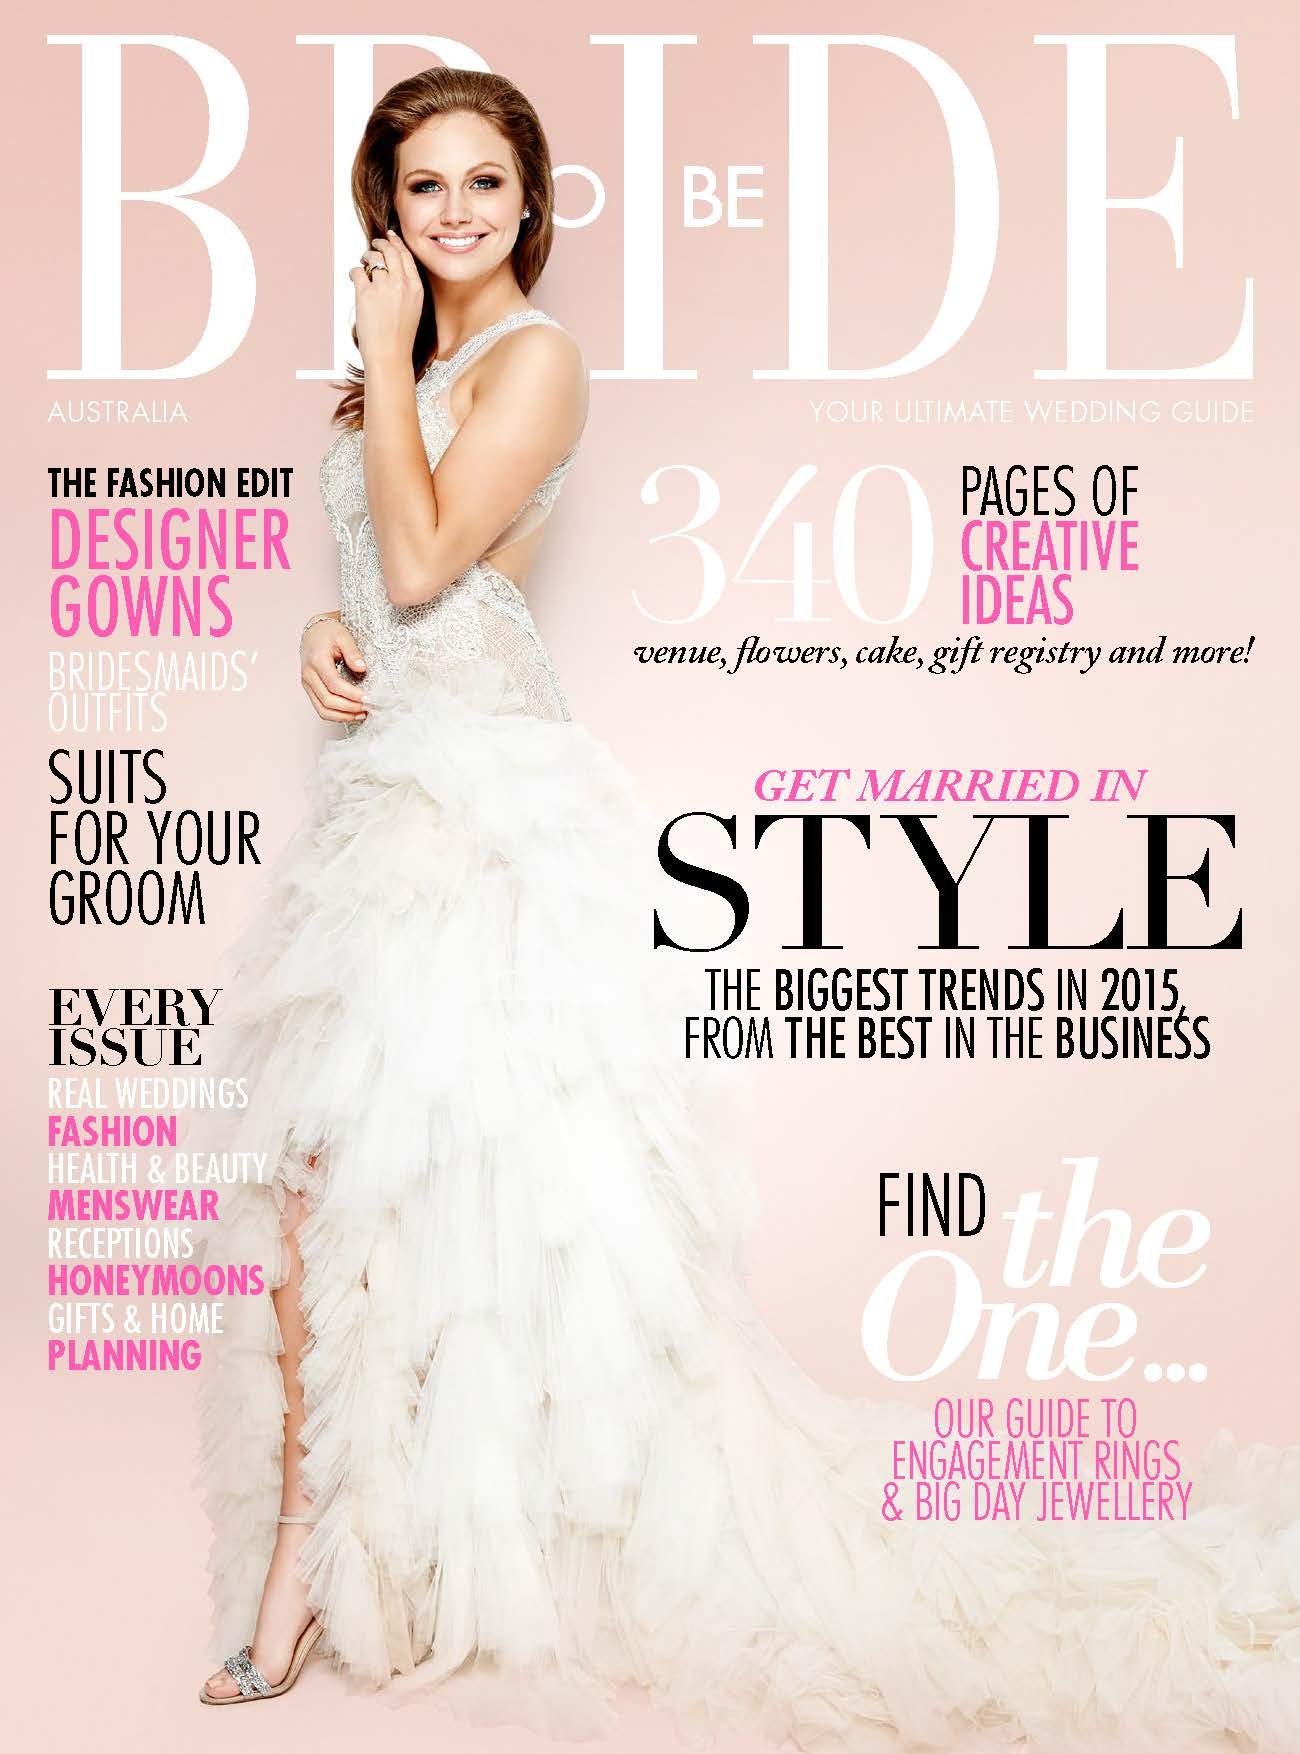 Bride to Be Magazine.jpg